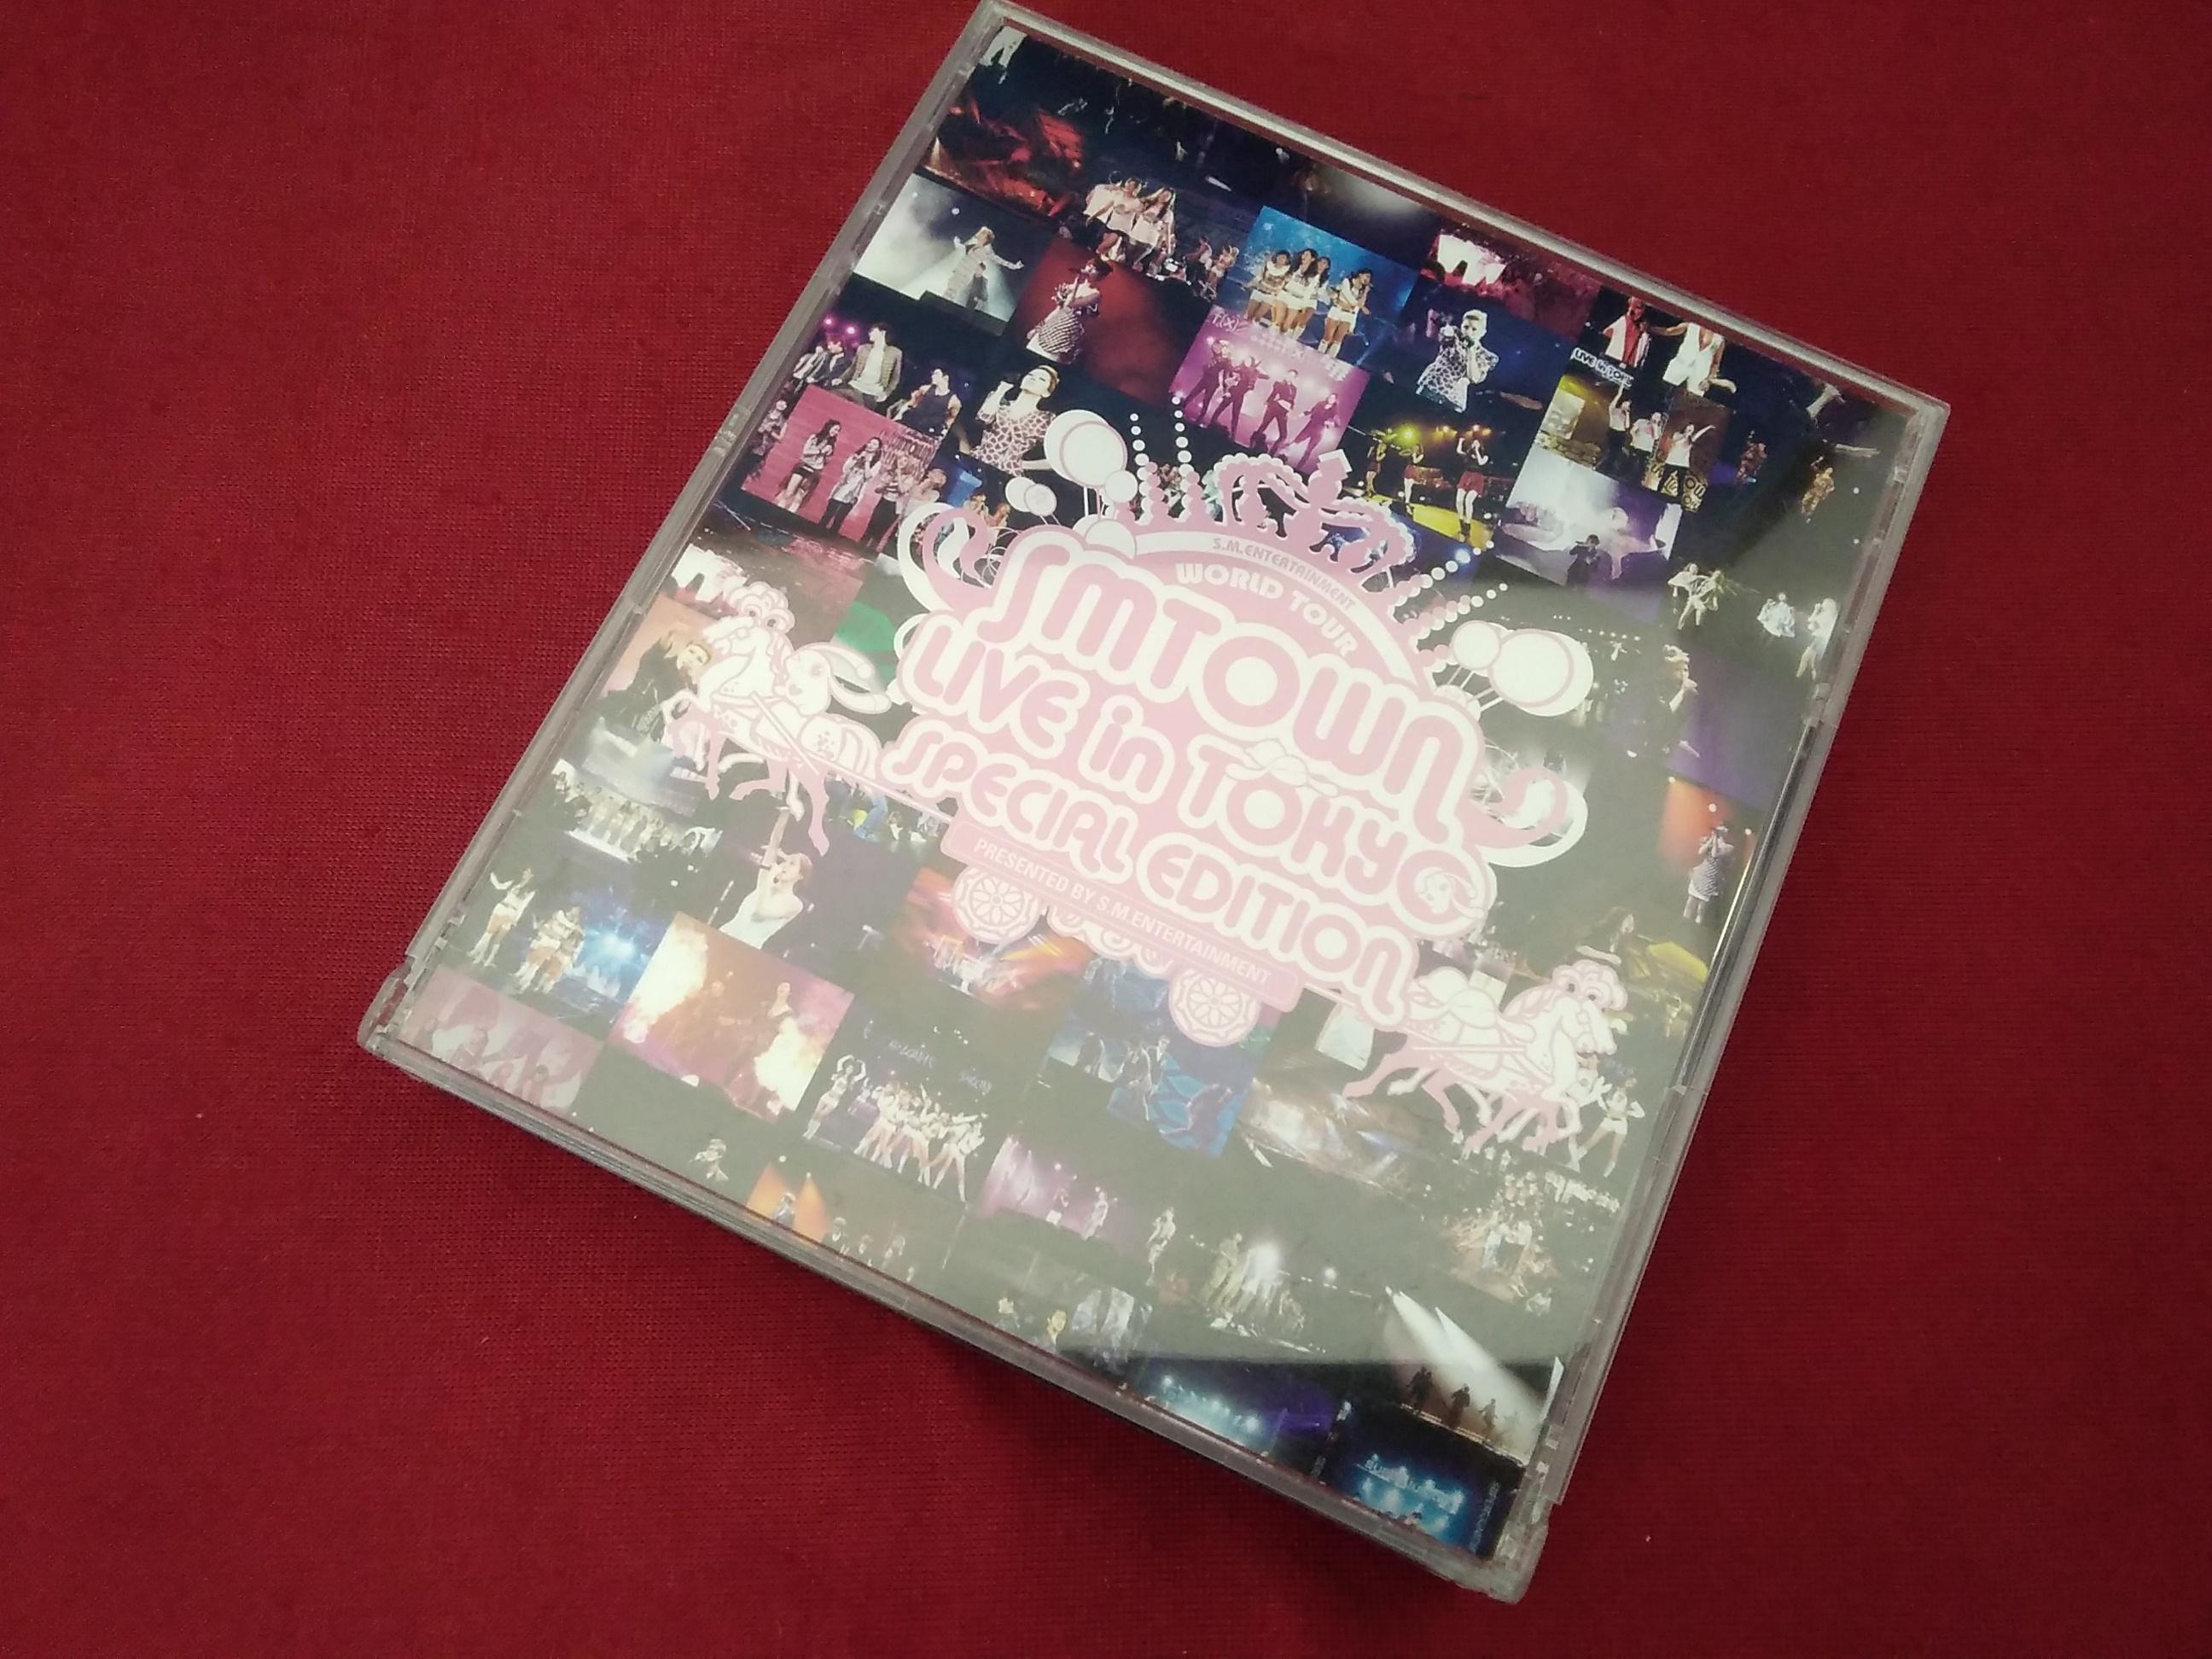 SMTOWN LIVE IN TOKYO SPECIAL EDITION|DVDK-POPオムニバス